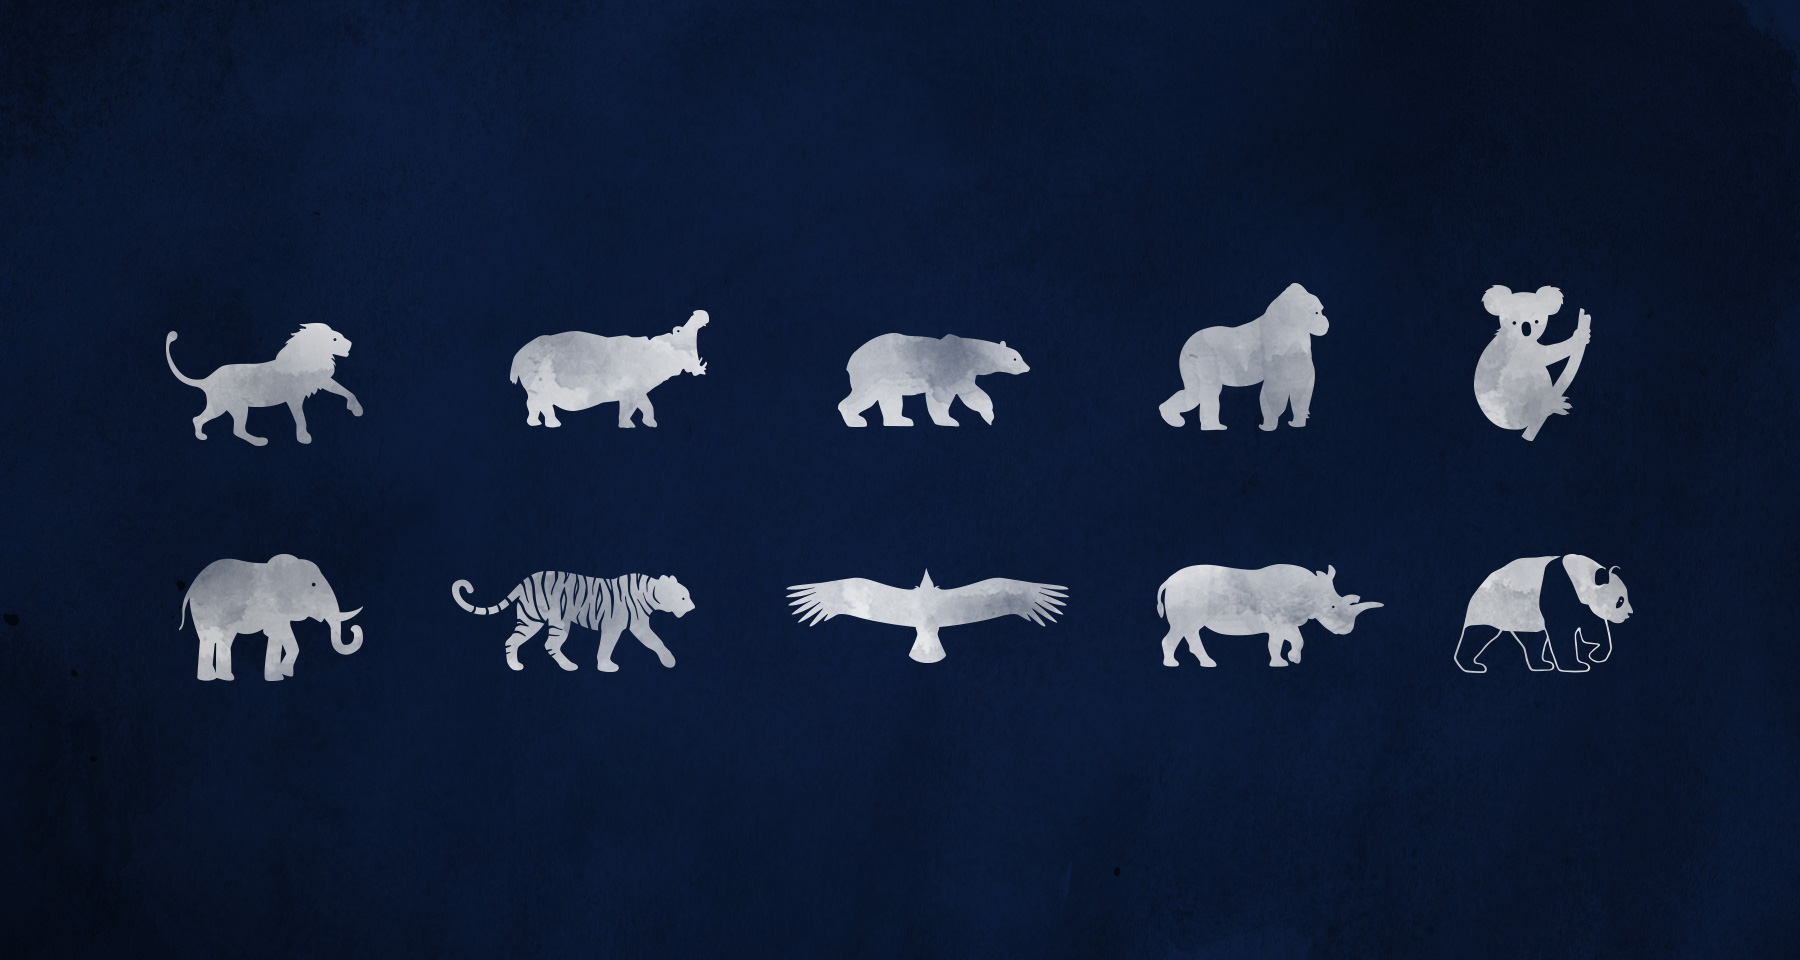 San Diego Zoo Centennial Icons